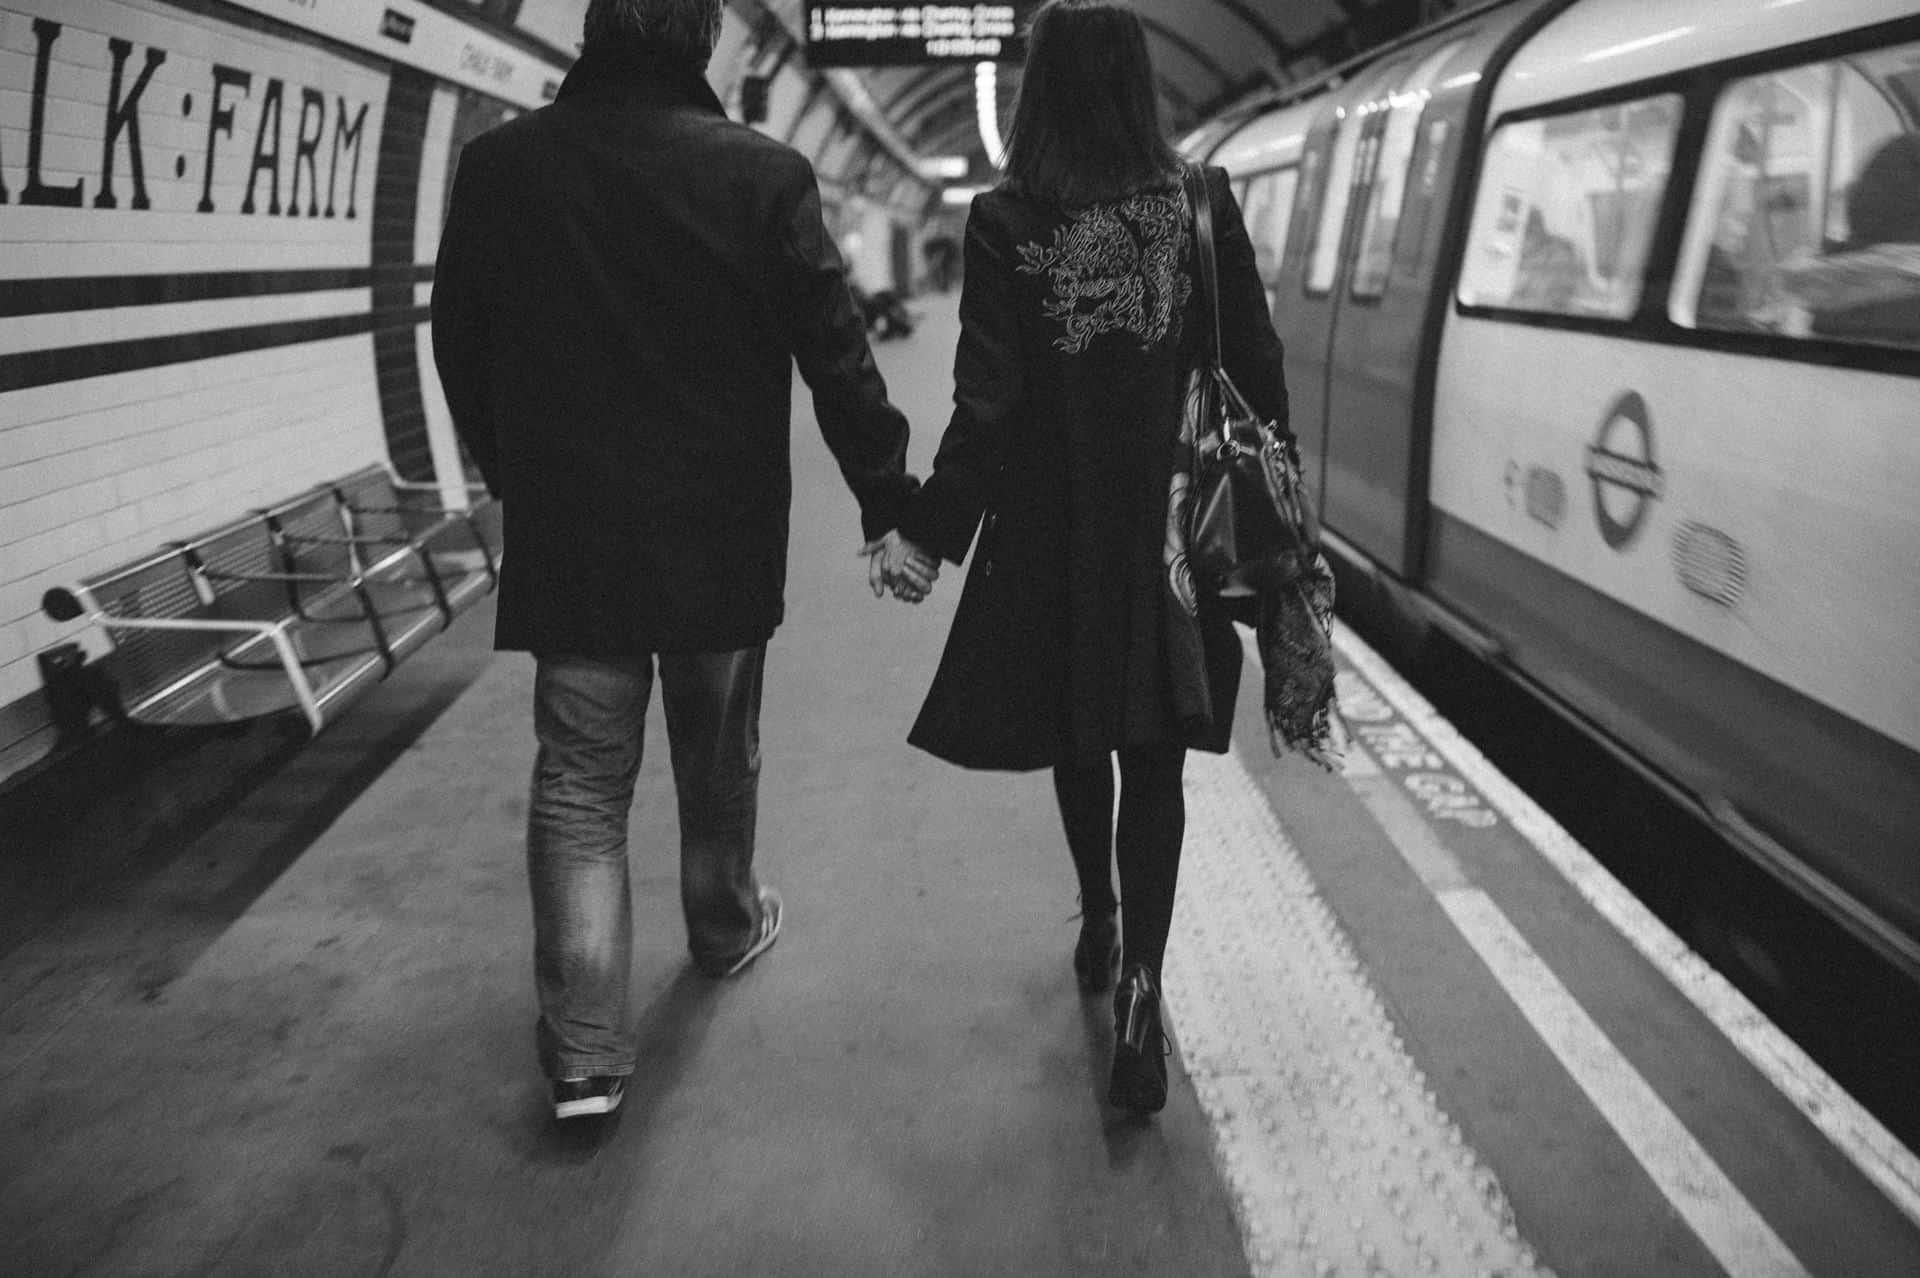 London engagement session